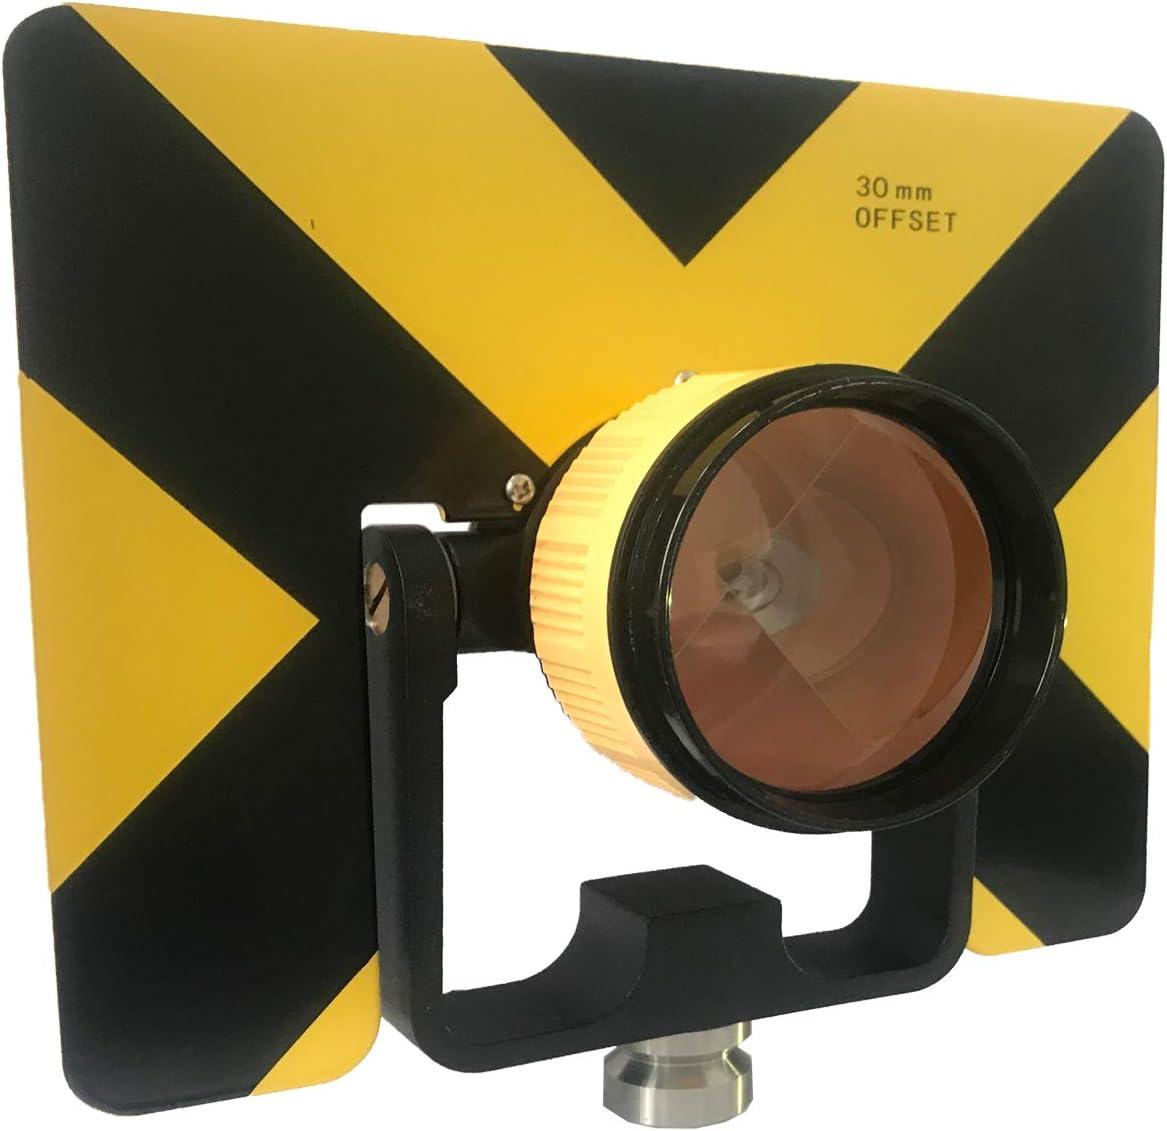 All-Metal Single Tilt Prism With Soft Bag for Land Surveying Prism for Leica Total Stations Surveying Prism